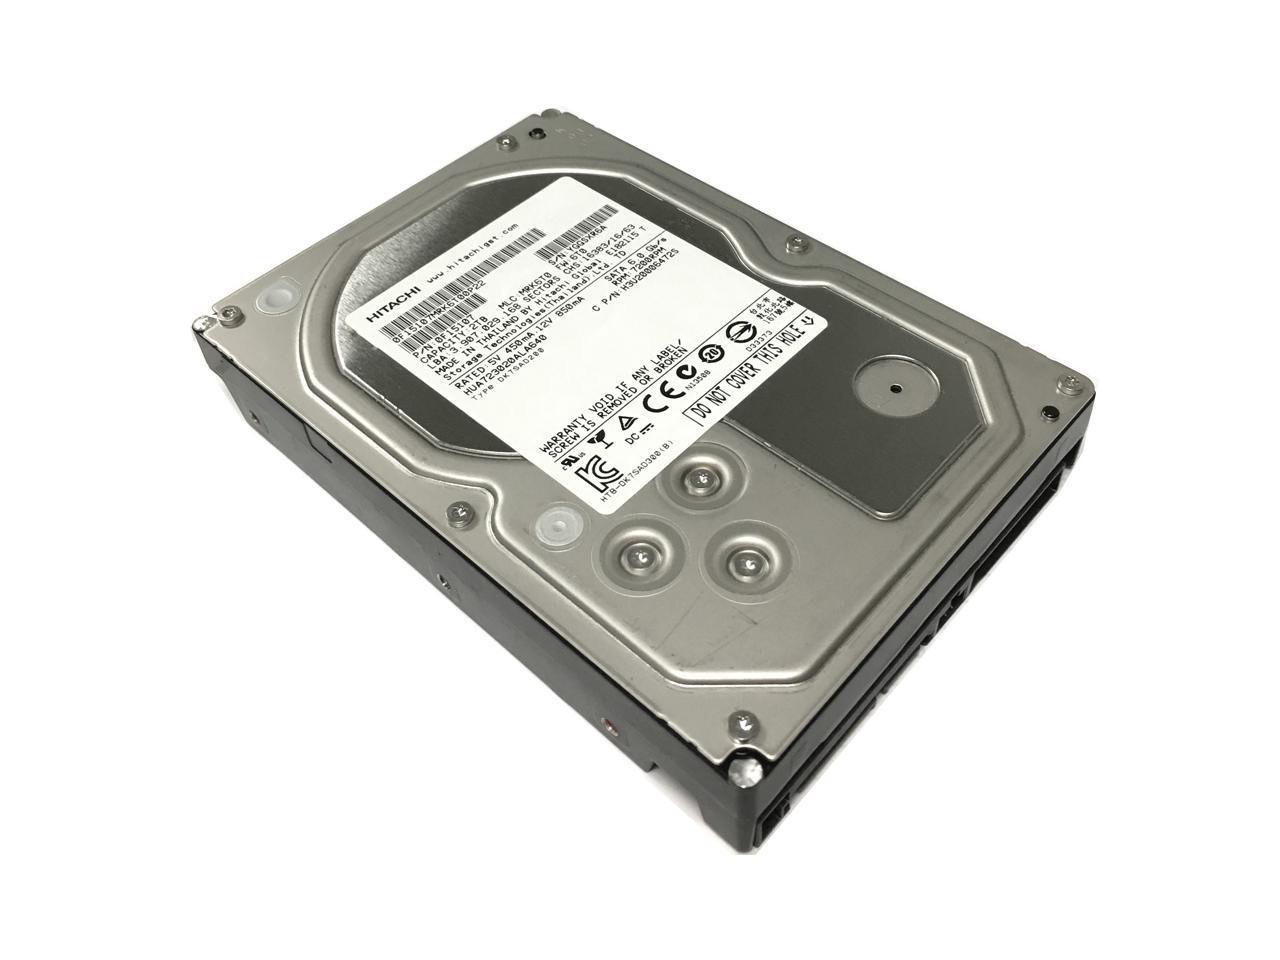 Hitachi Global Storage 2TB Ultrastar A7K3000 Sata 7200RPM 3.5 Internal Hard Drive HUA723020ALA640 0F12455